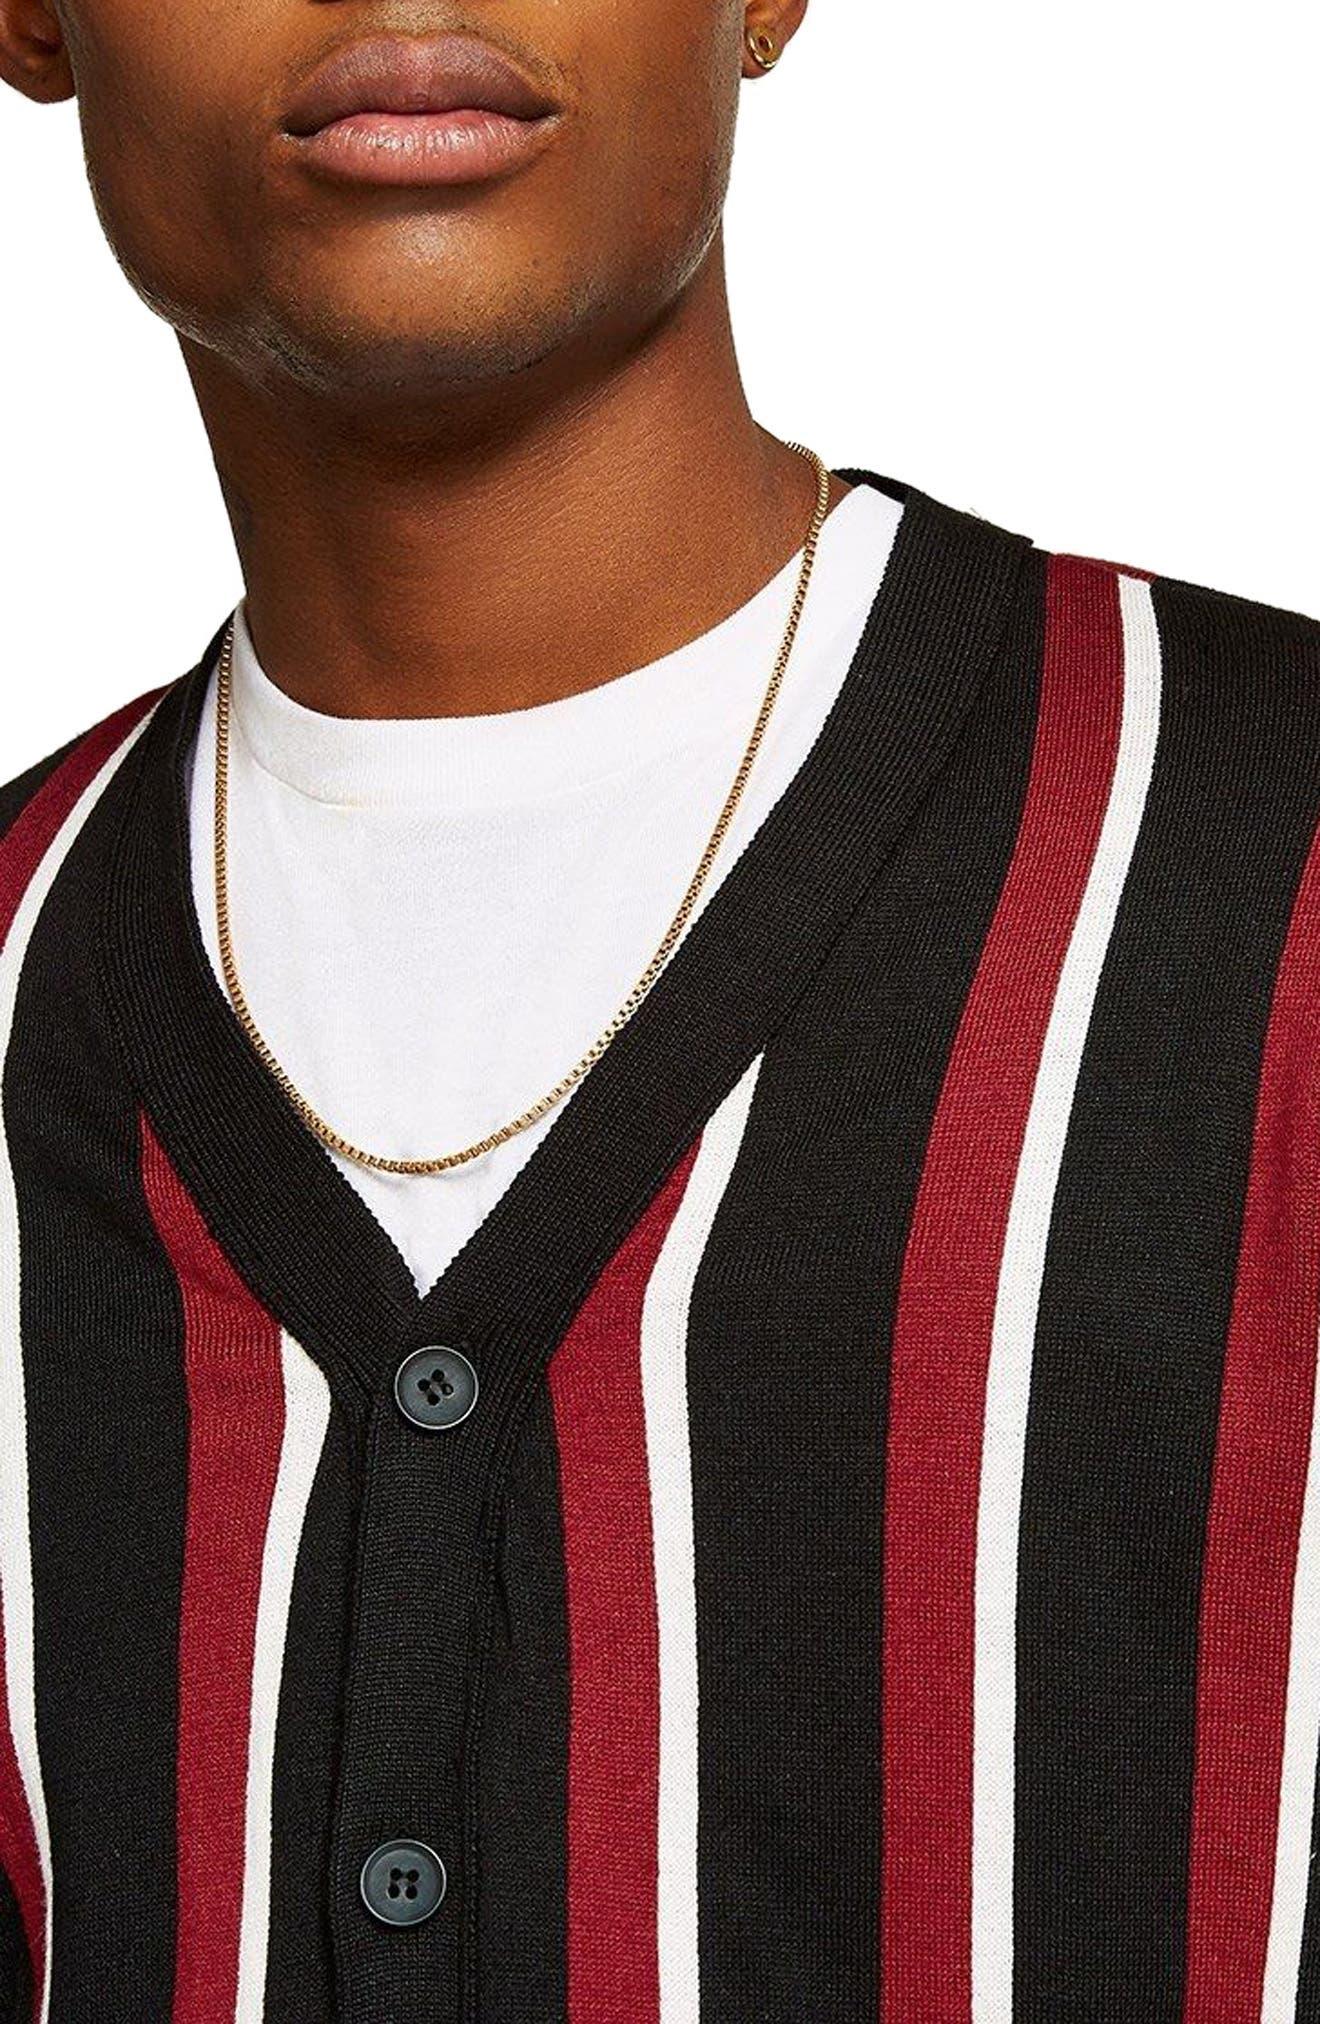 Slim Fit Stripe Cardigan,                             Alternate thumbnail 3, color,                             001